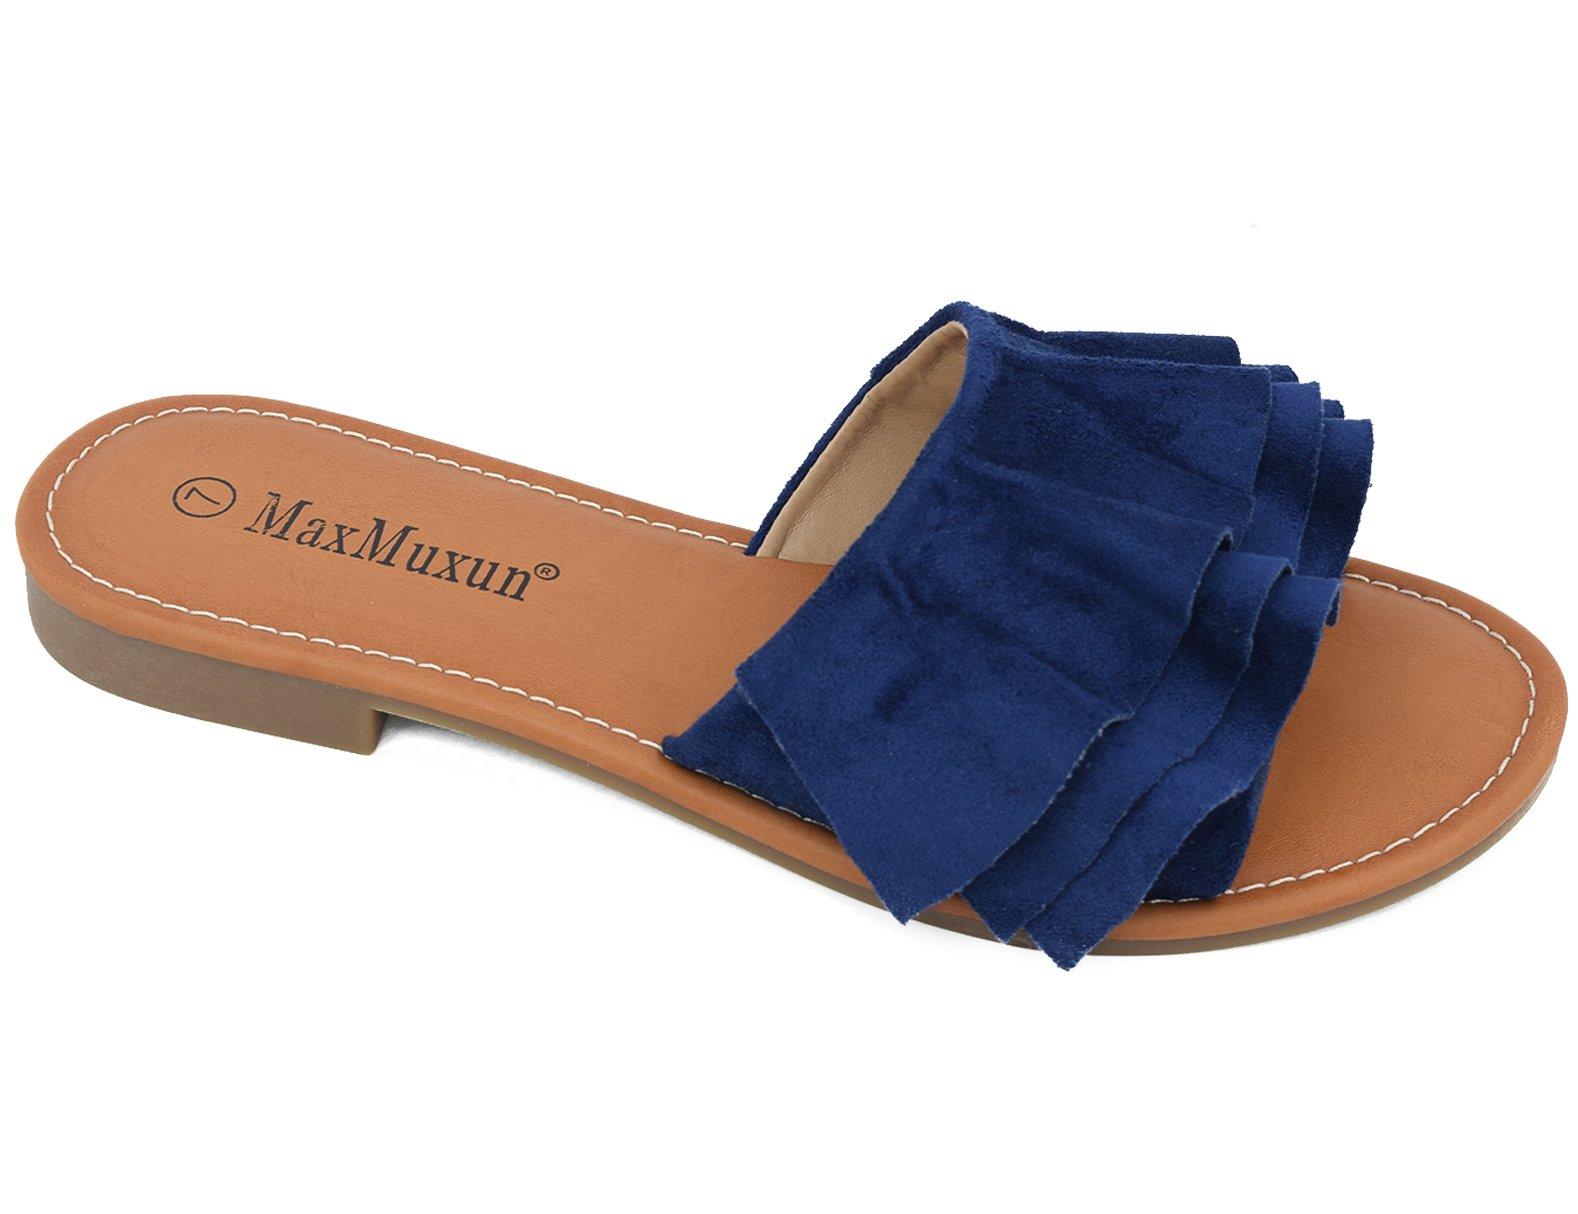 MaxMuxun Blue Women Shoes Suede Ruffle Flat Sandals